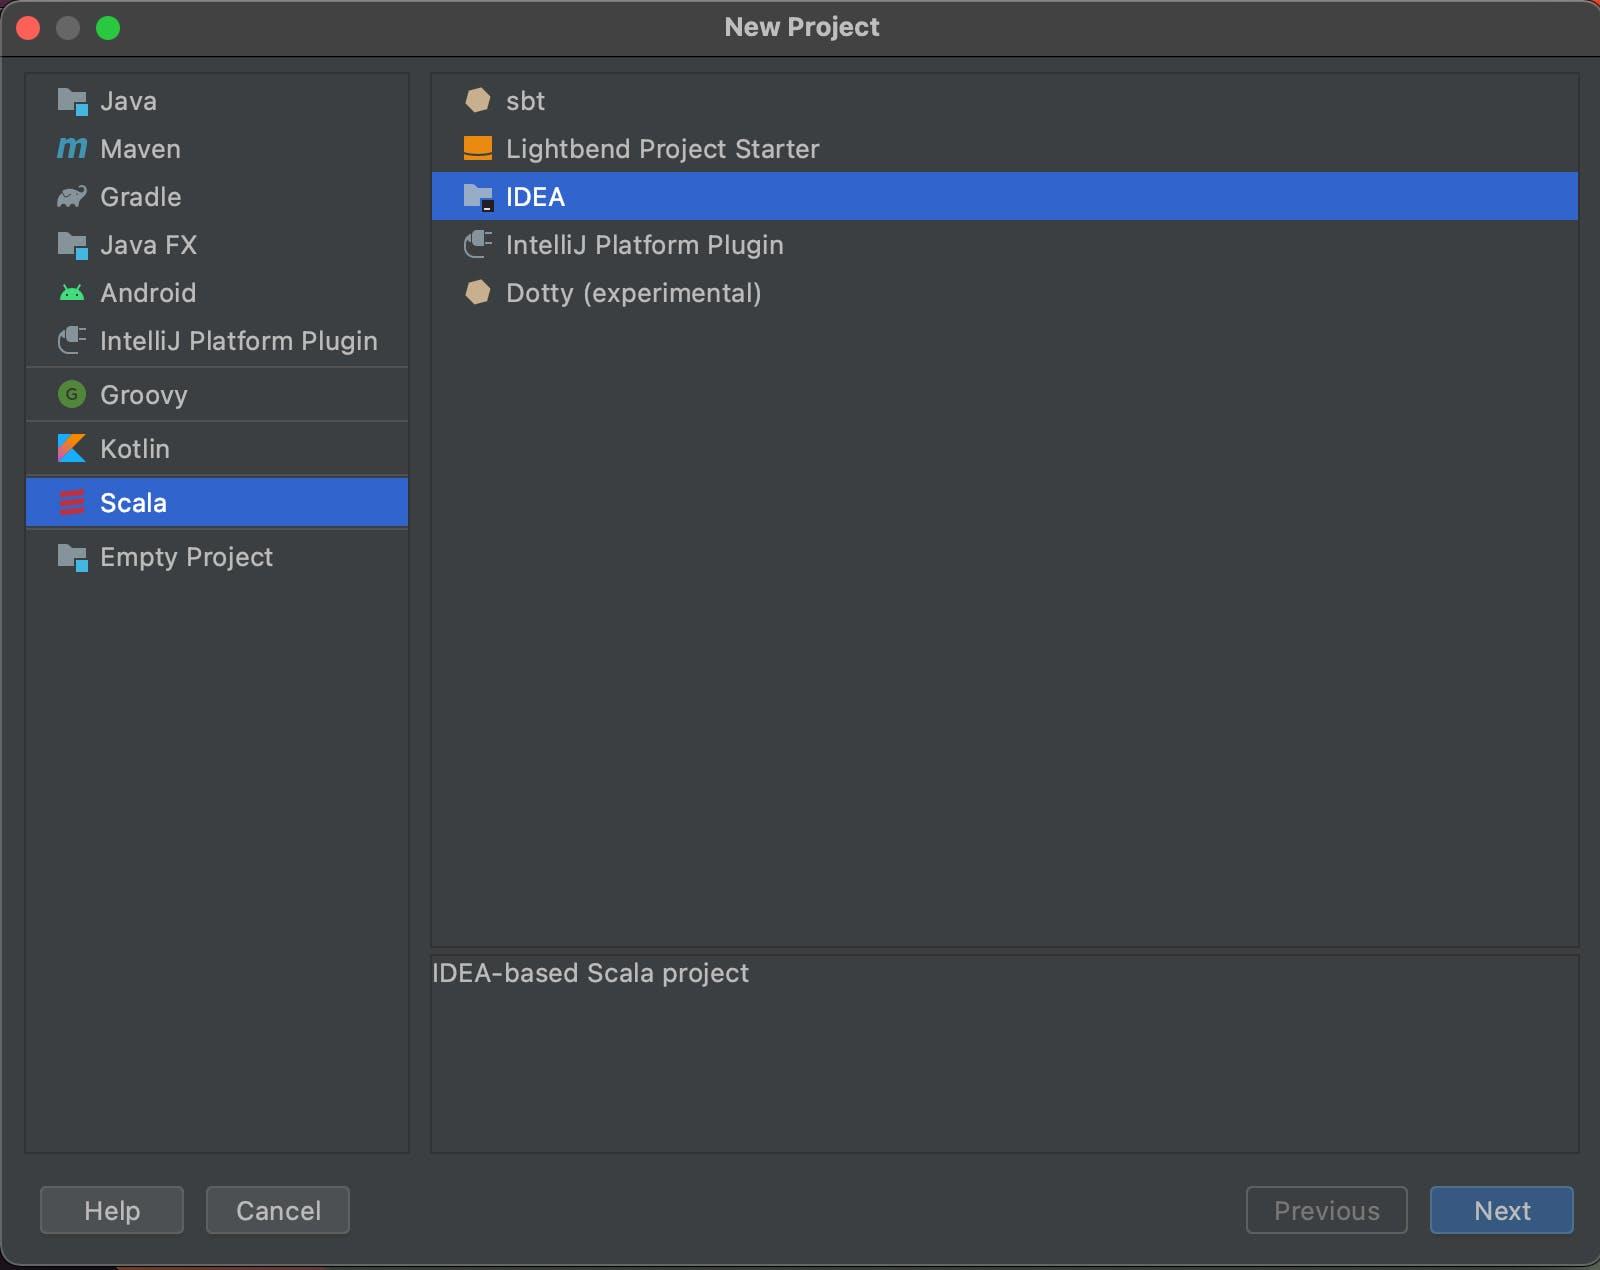 setup_project.png